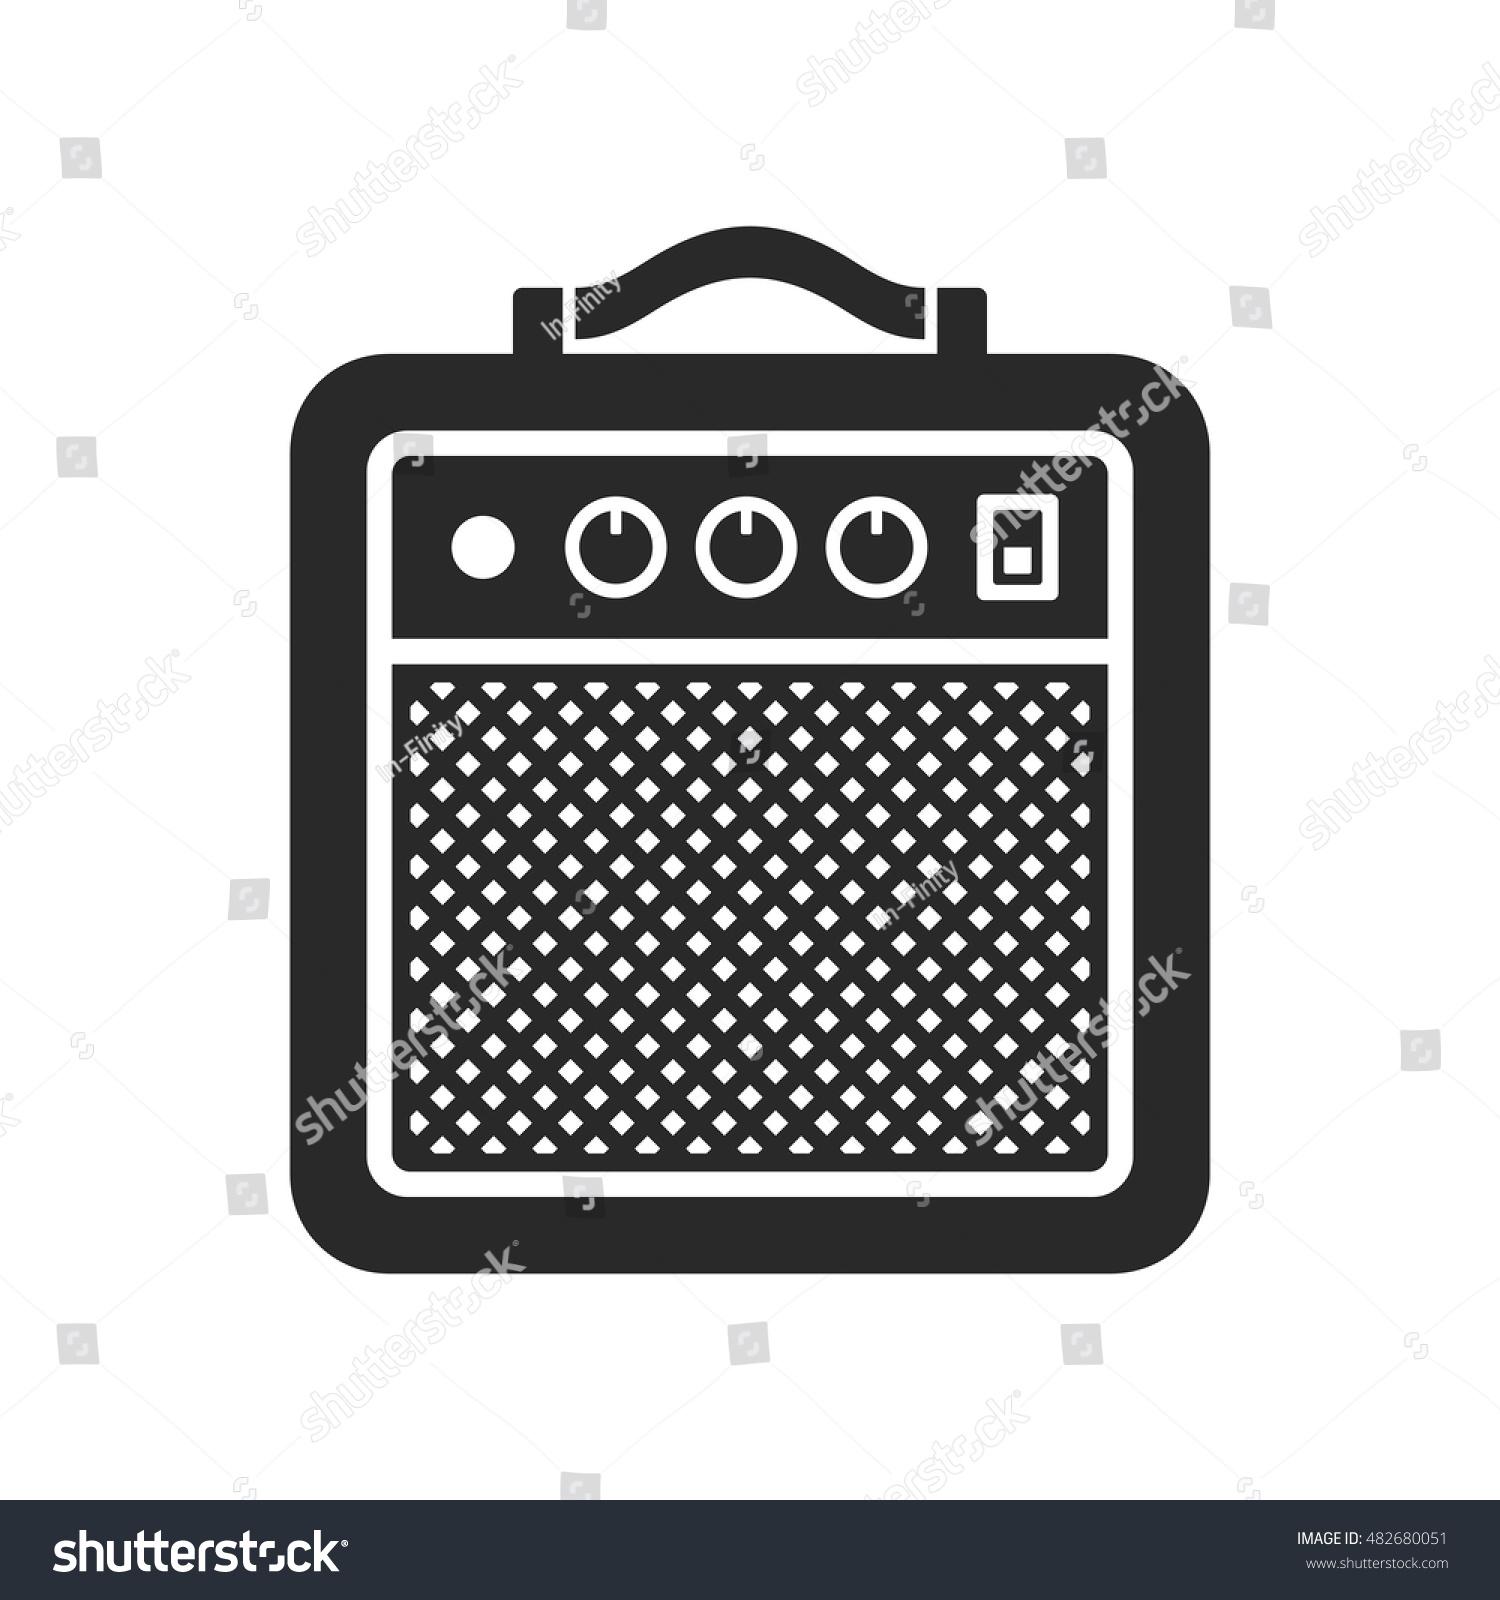 amplifier icon vector stock vector 482680051 shutterstock